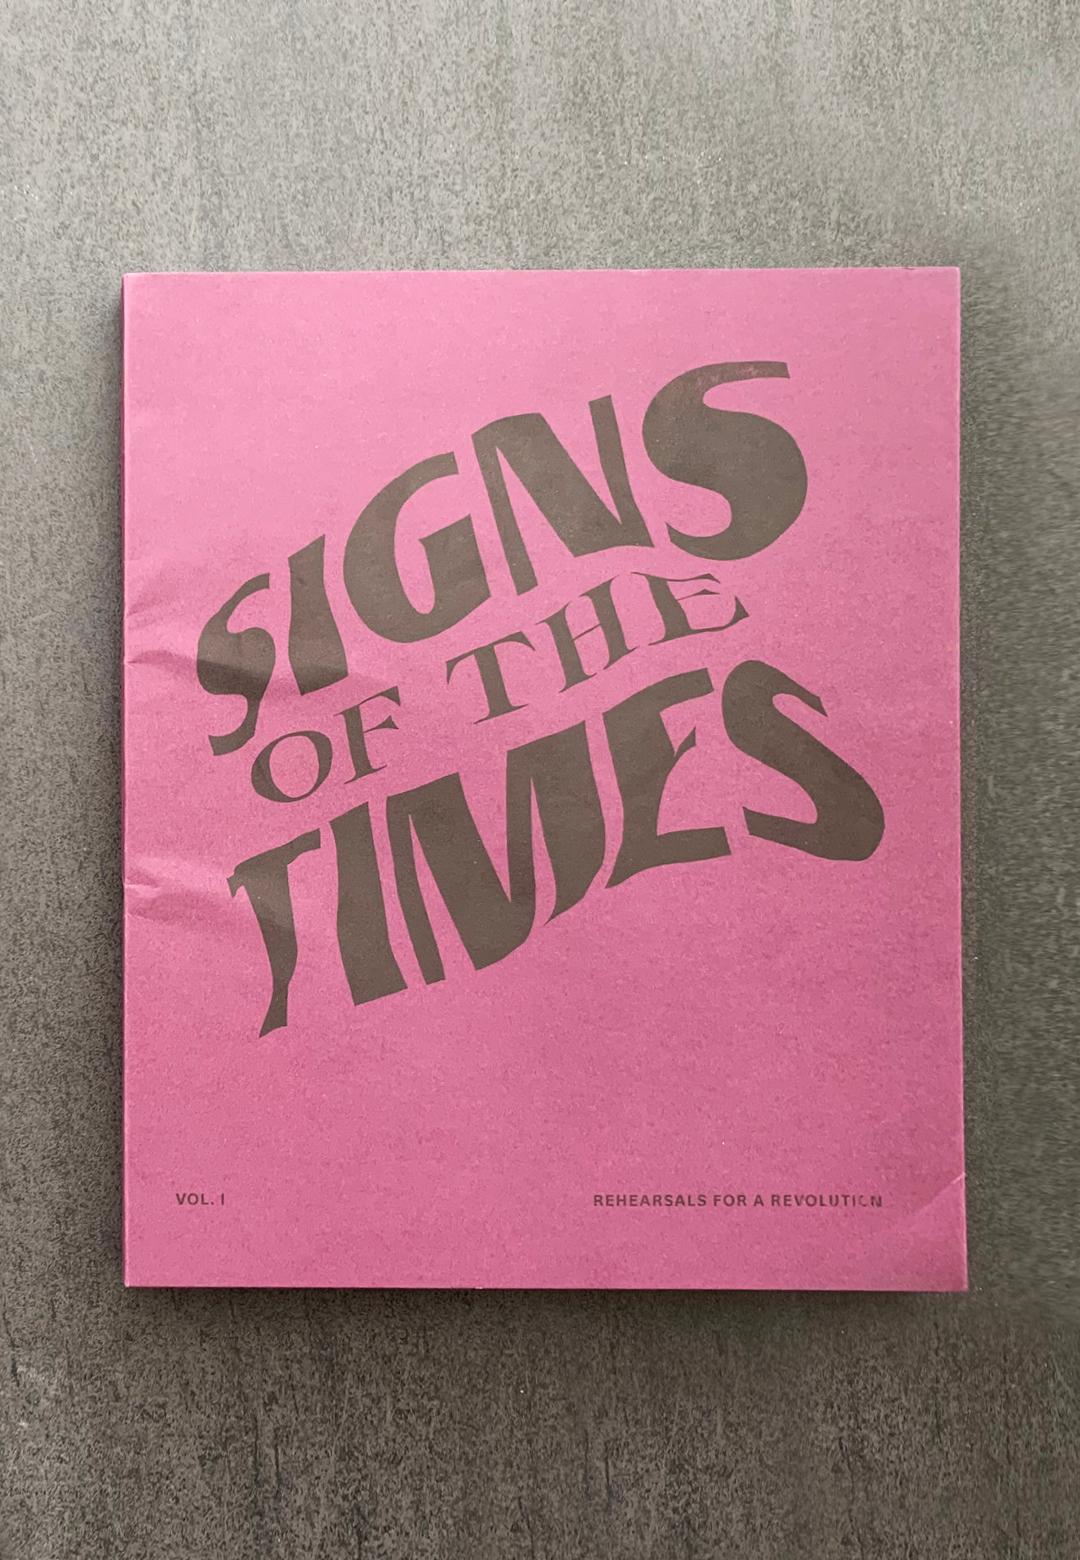 Signs of the times | Rehearsals for a revolution | Julius Wiedemann | STIR